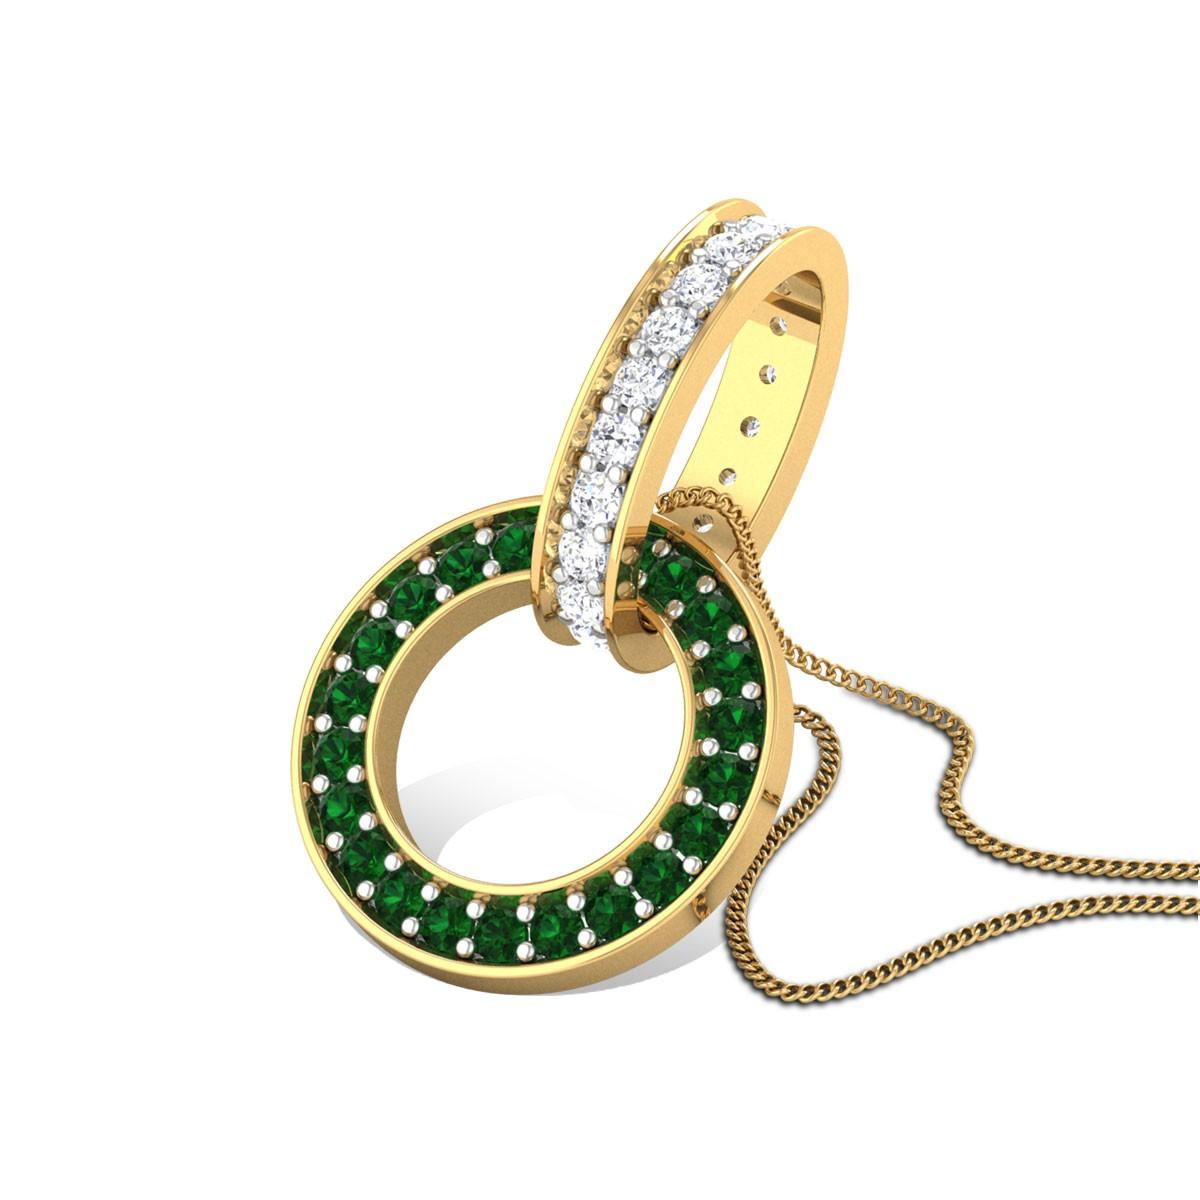 Interlinked Rings Diamond Pendant